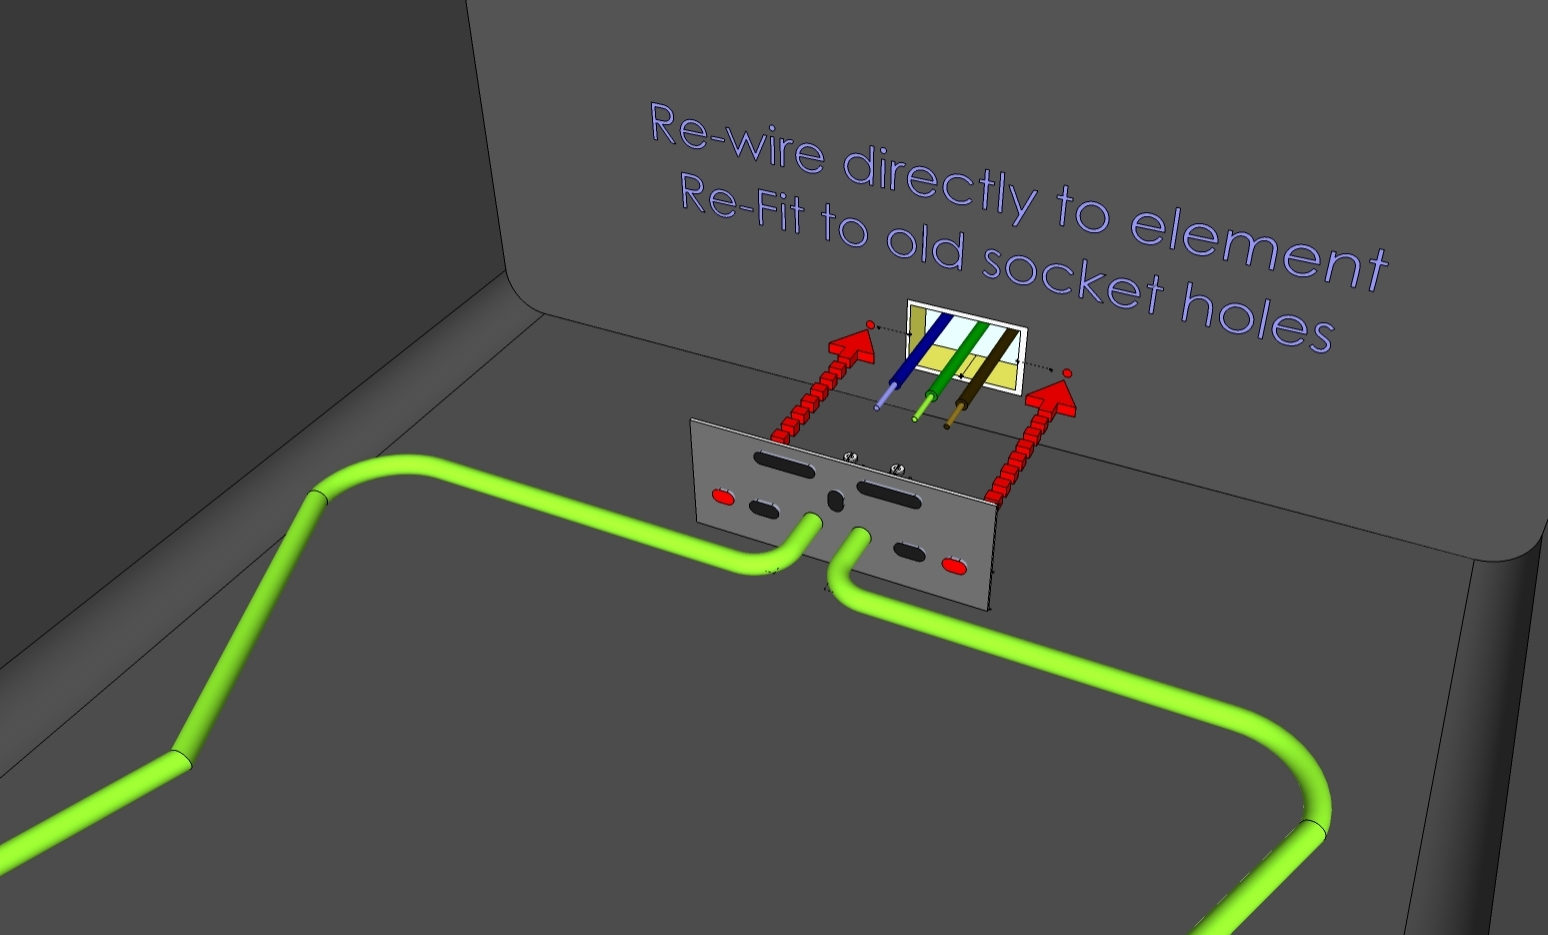 Socket Oven Re fit.jpg